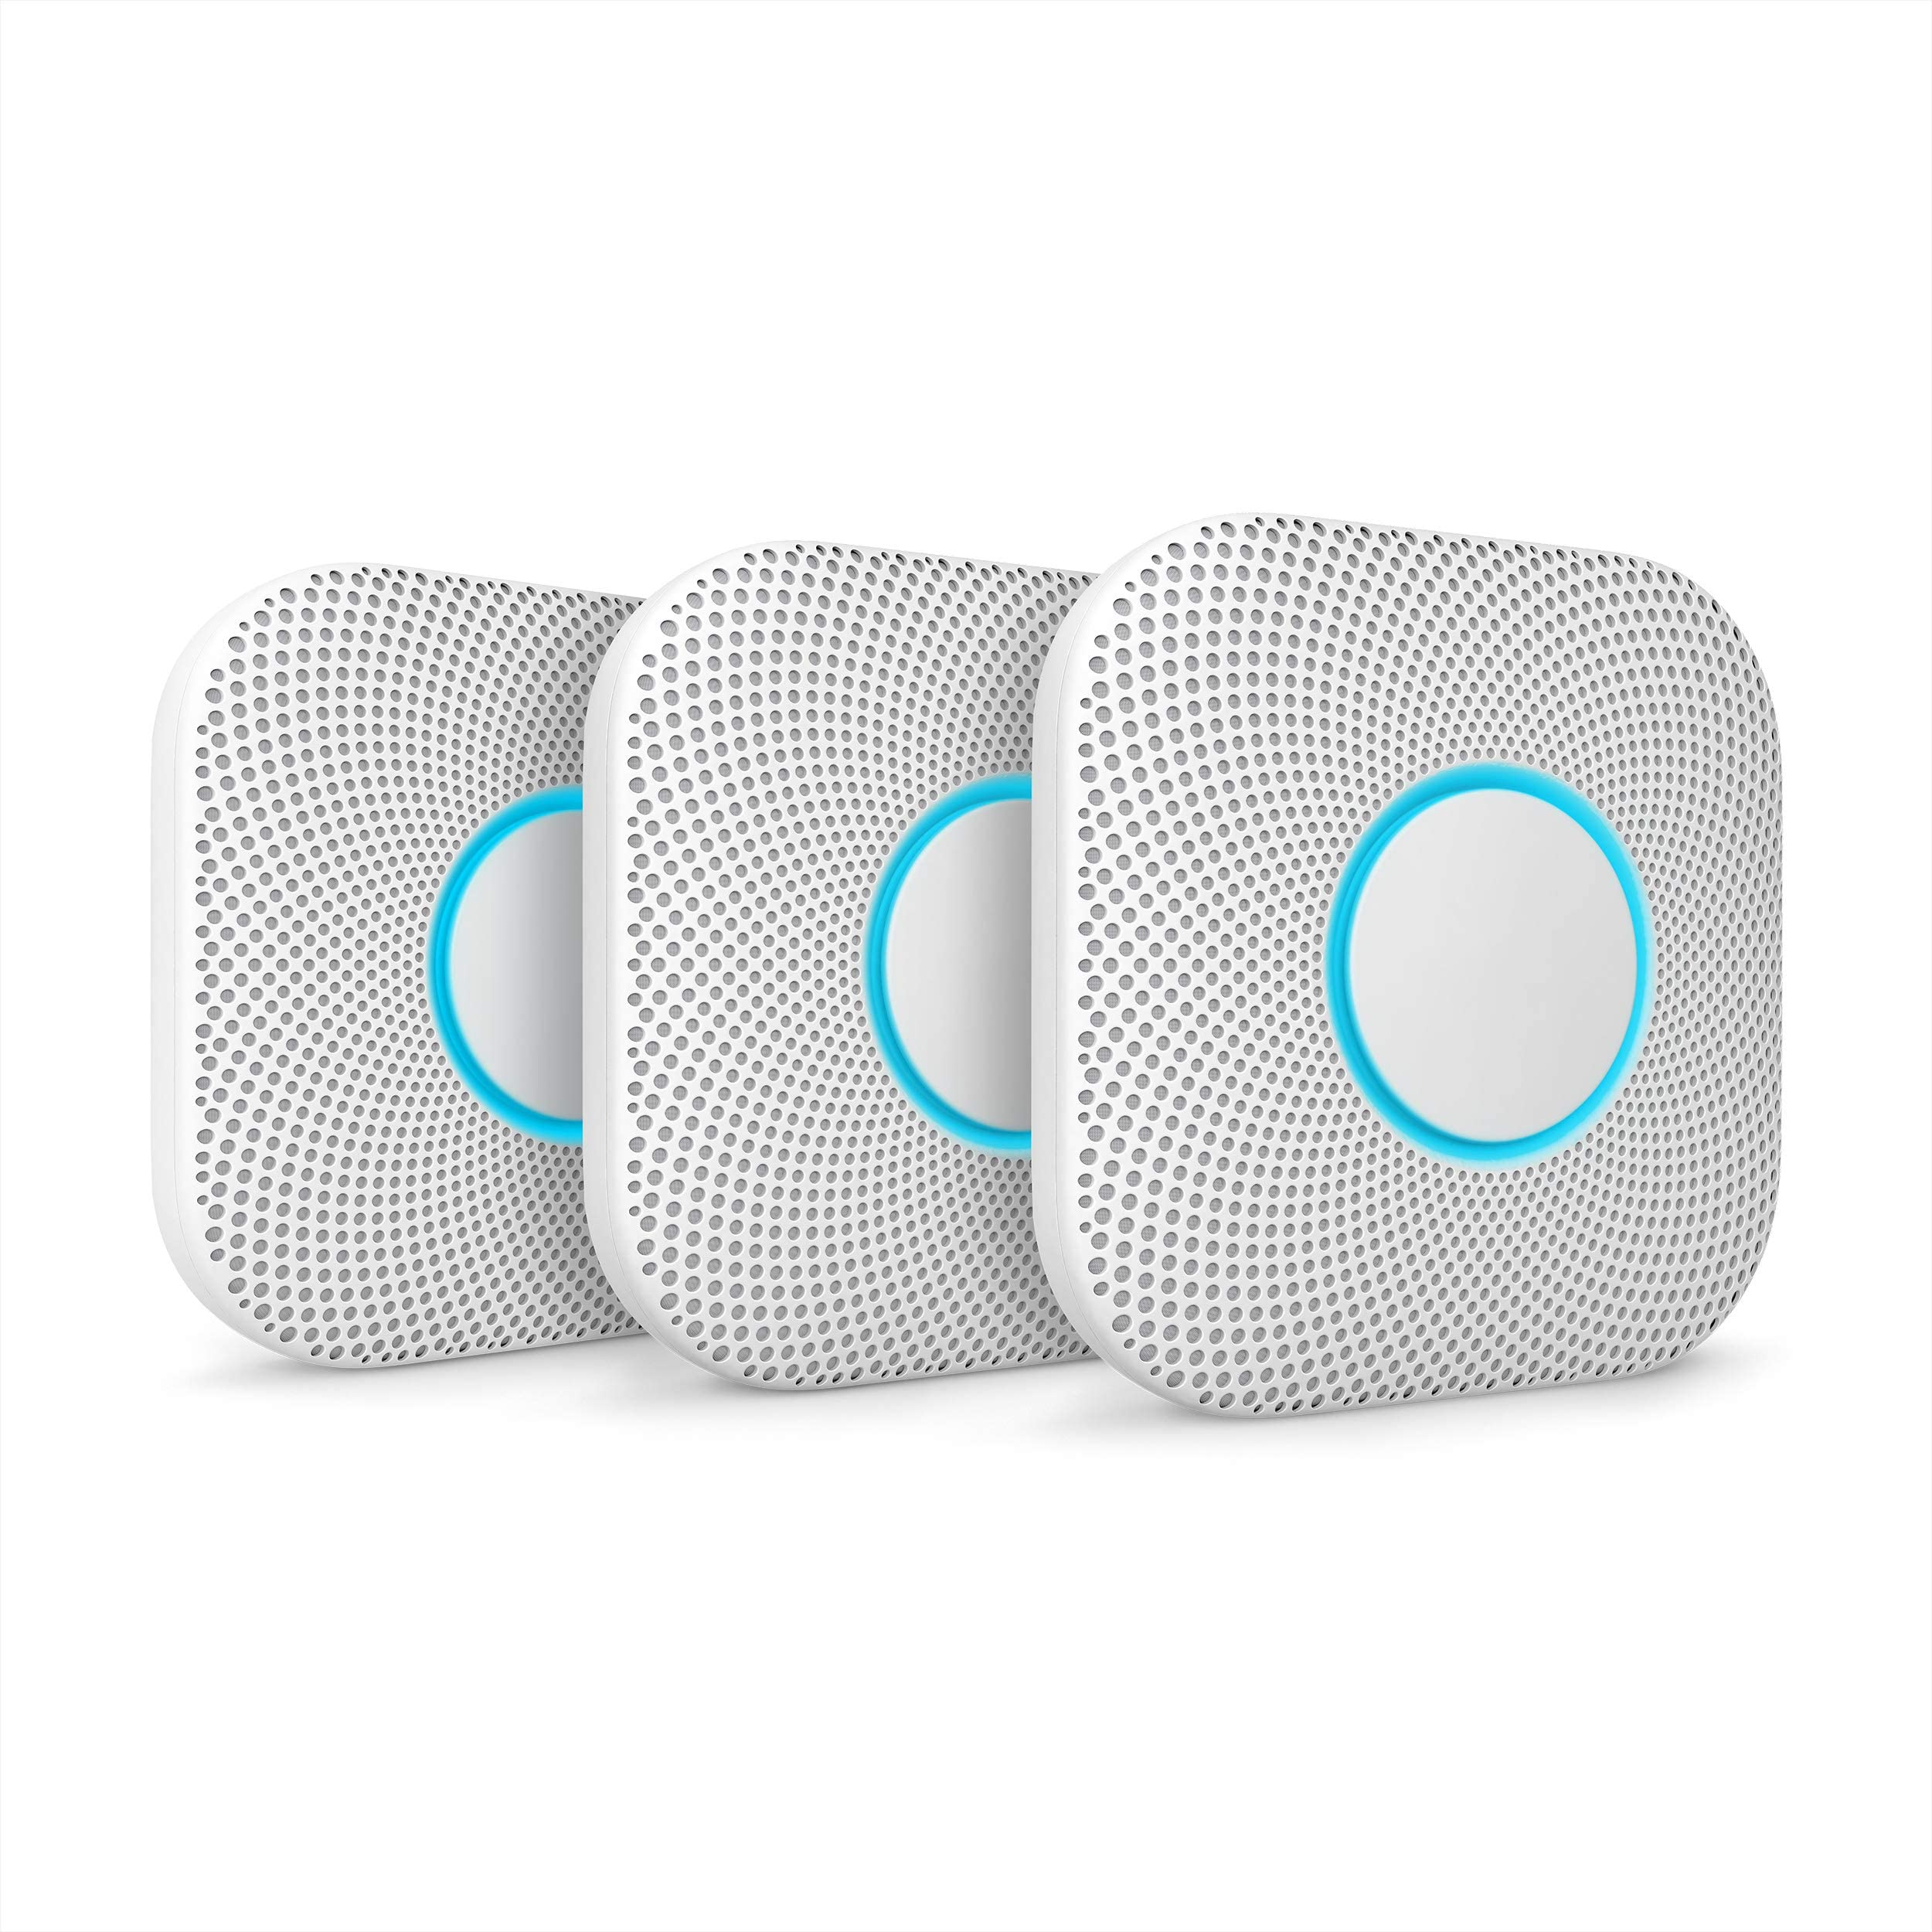 Google S3006WBUS Nest Protect, S3000BWES, 2nd Gen, Battery, 3-Pack Alarm-Smoke Carbon Monoxide Detector, 3, White